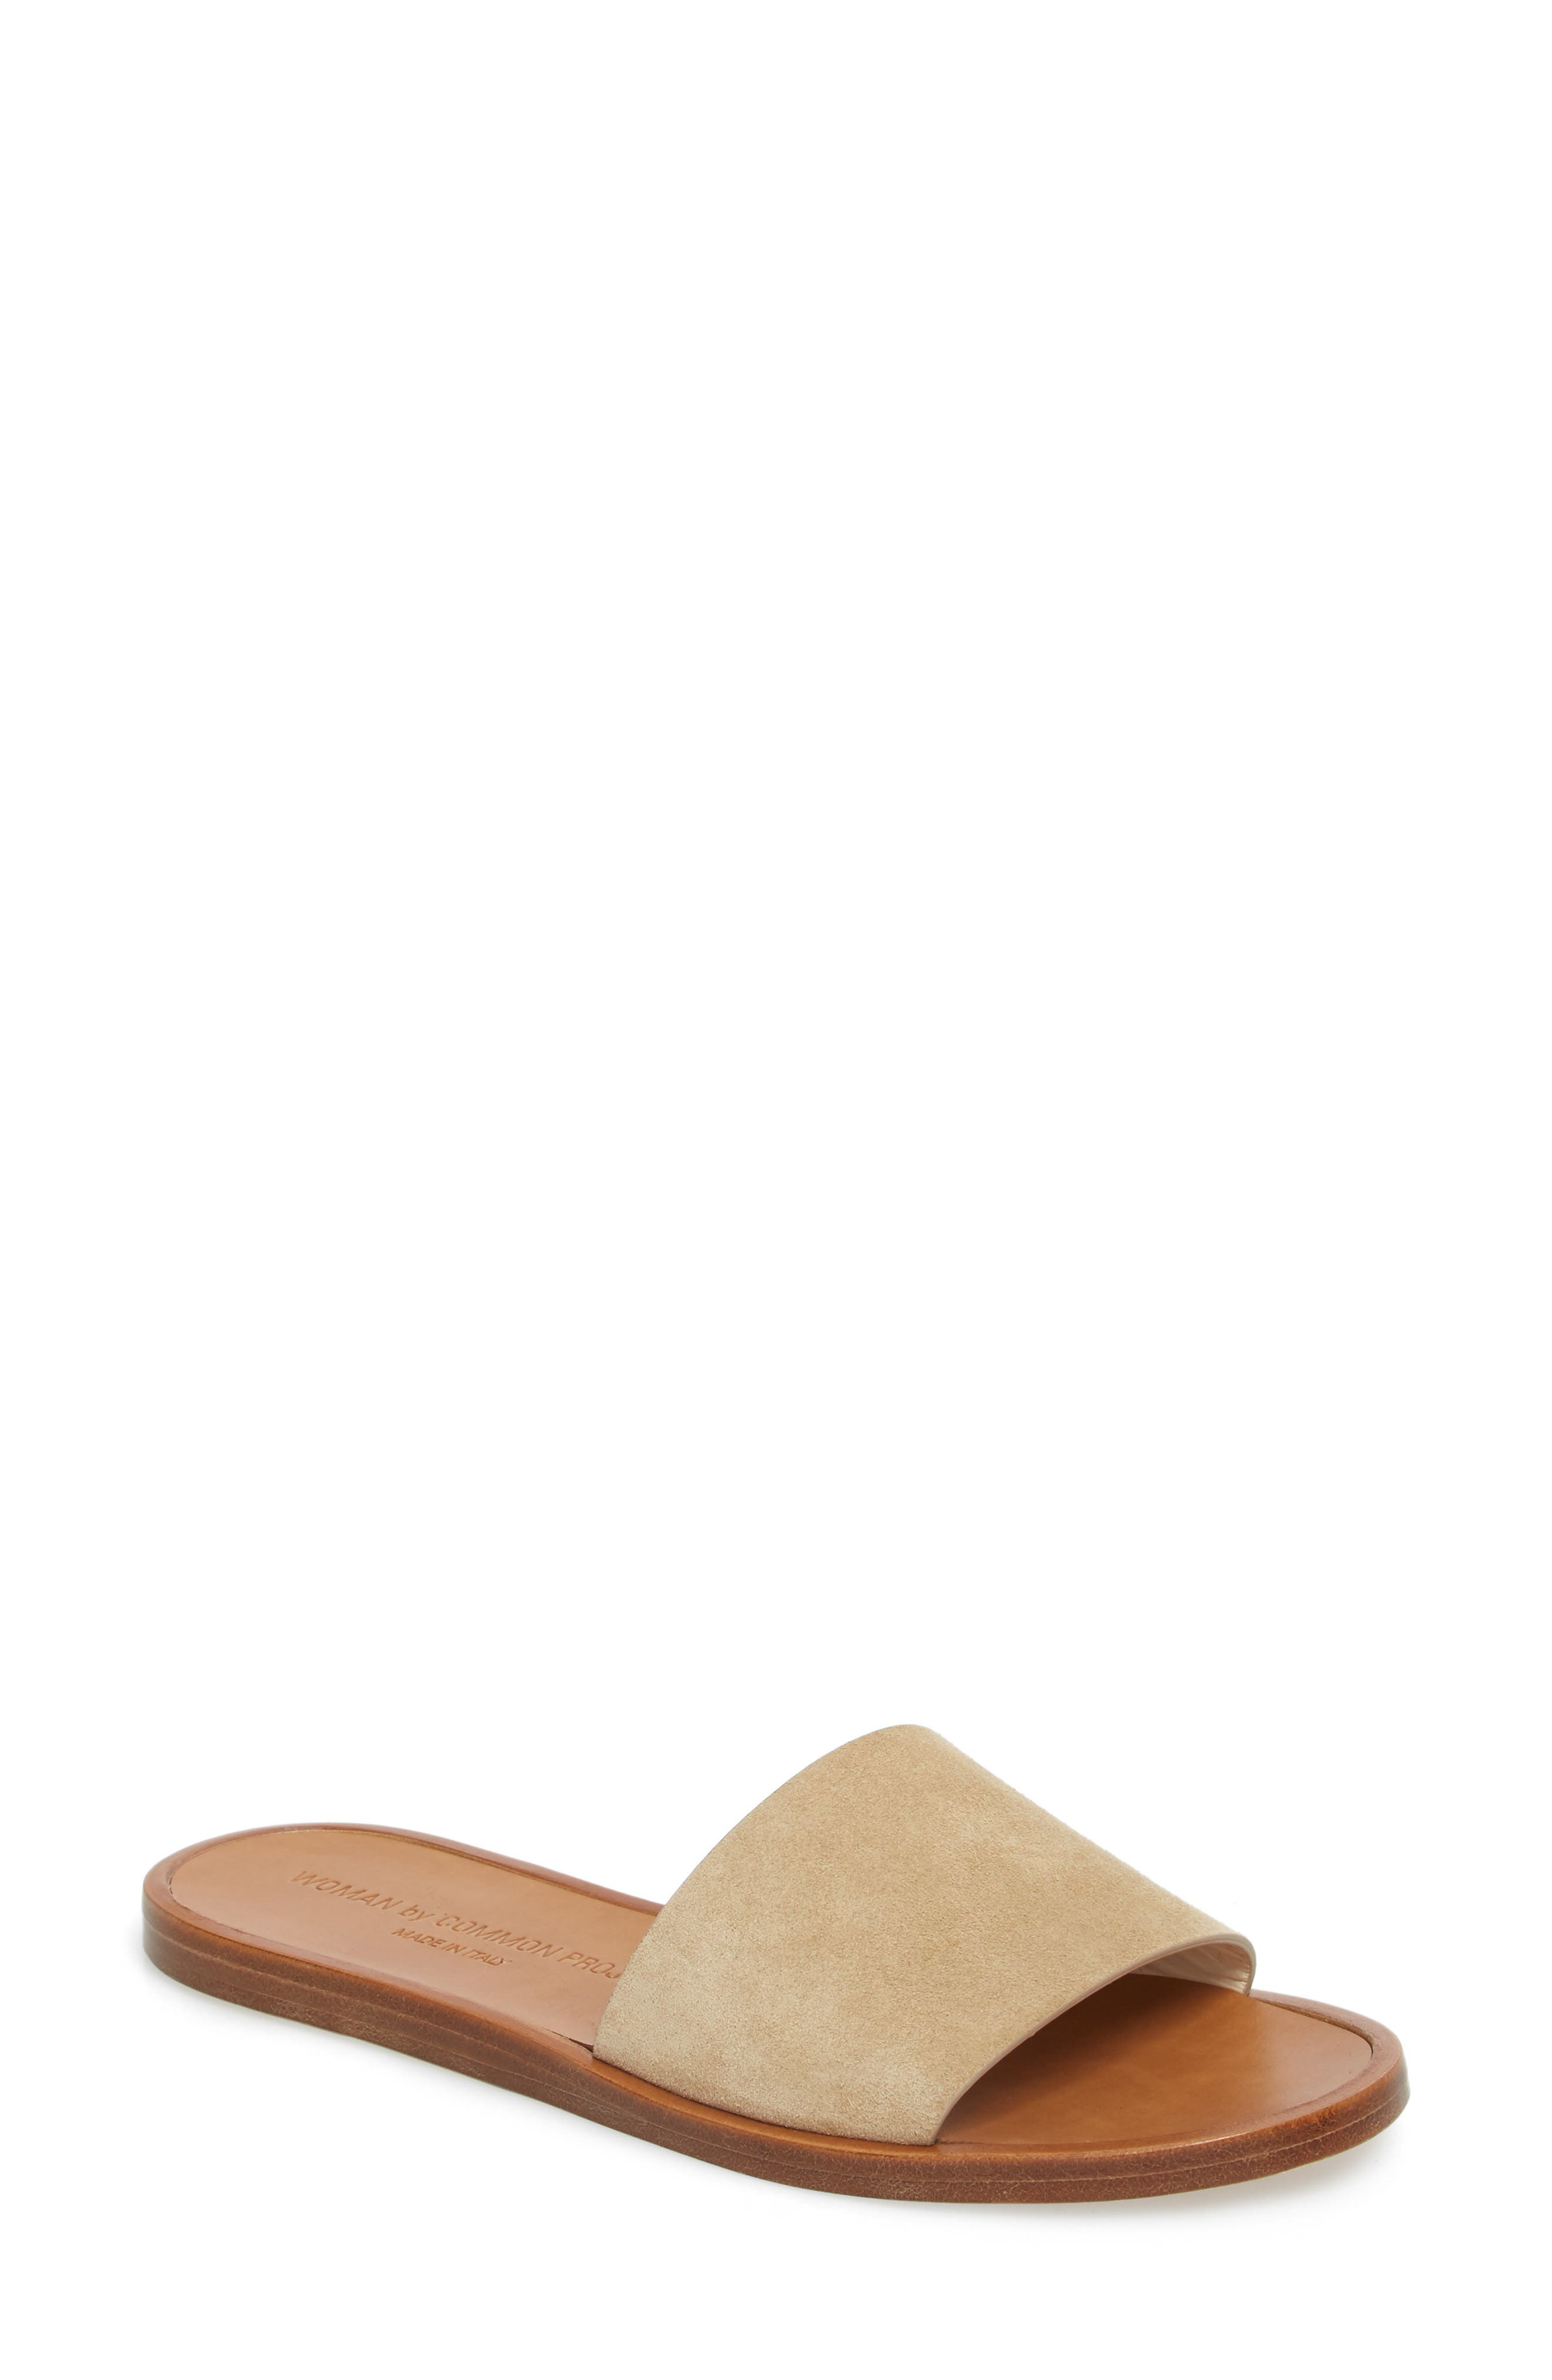 Slide Sandal,                         Main,                         color, Tan